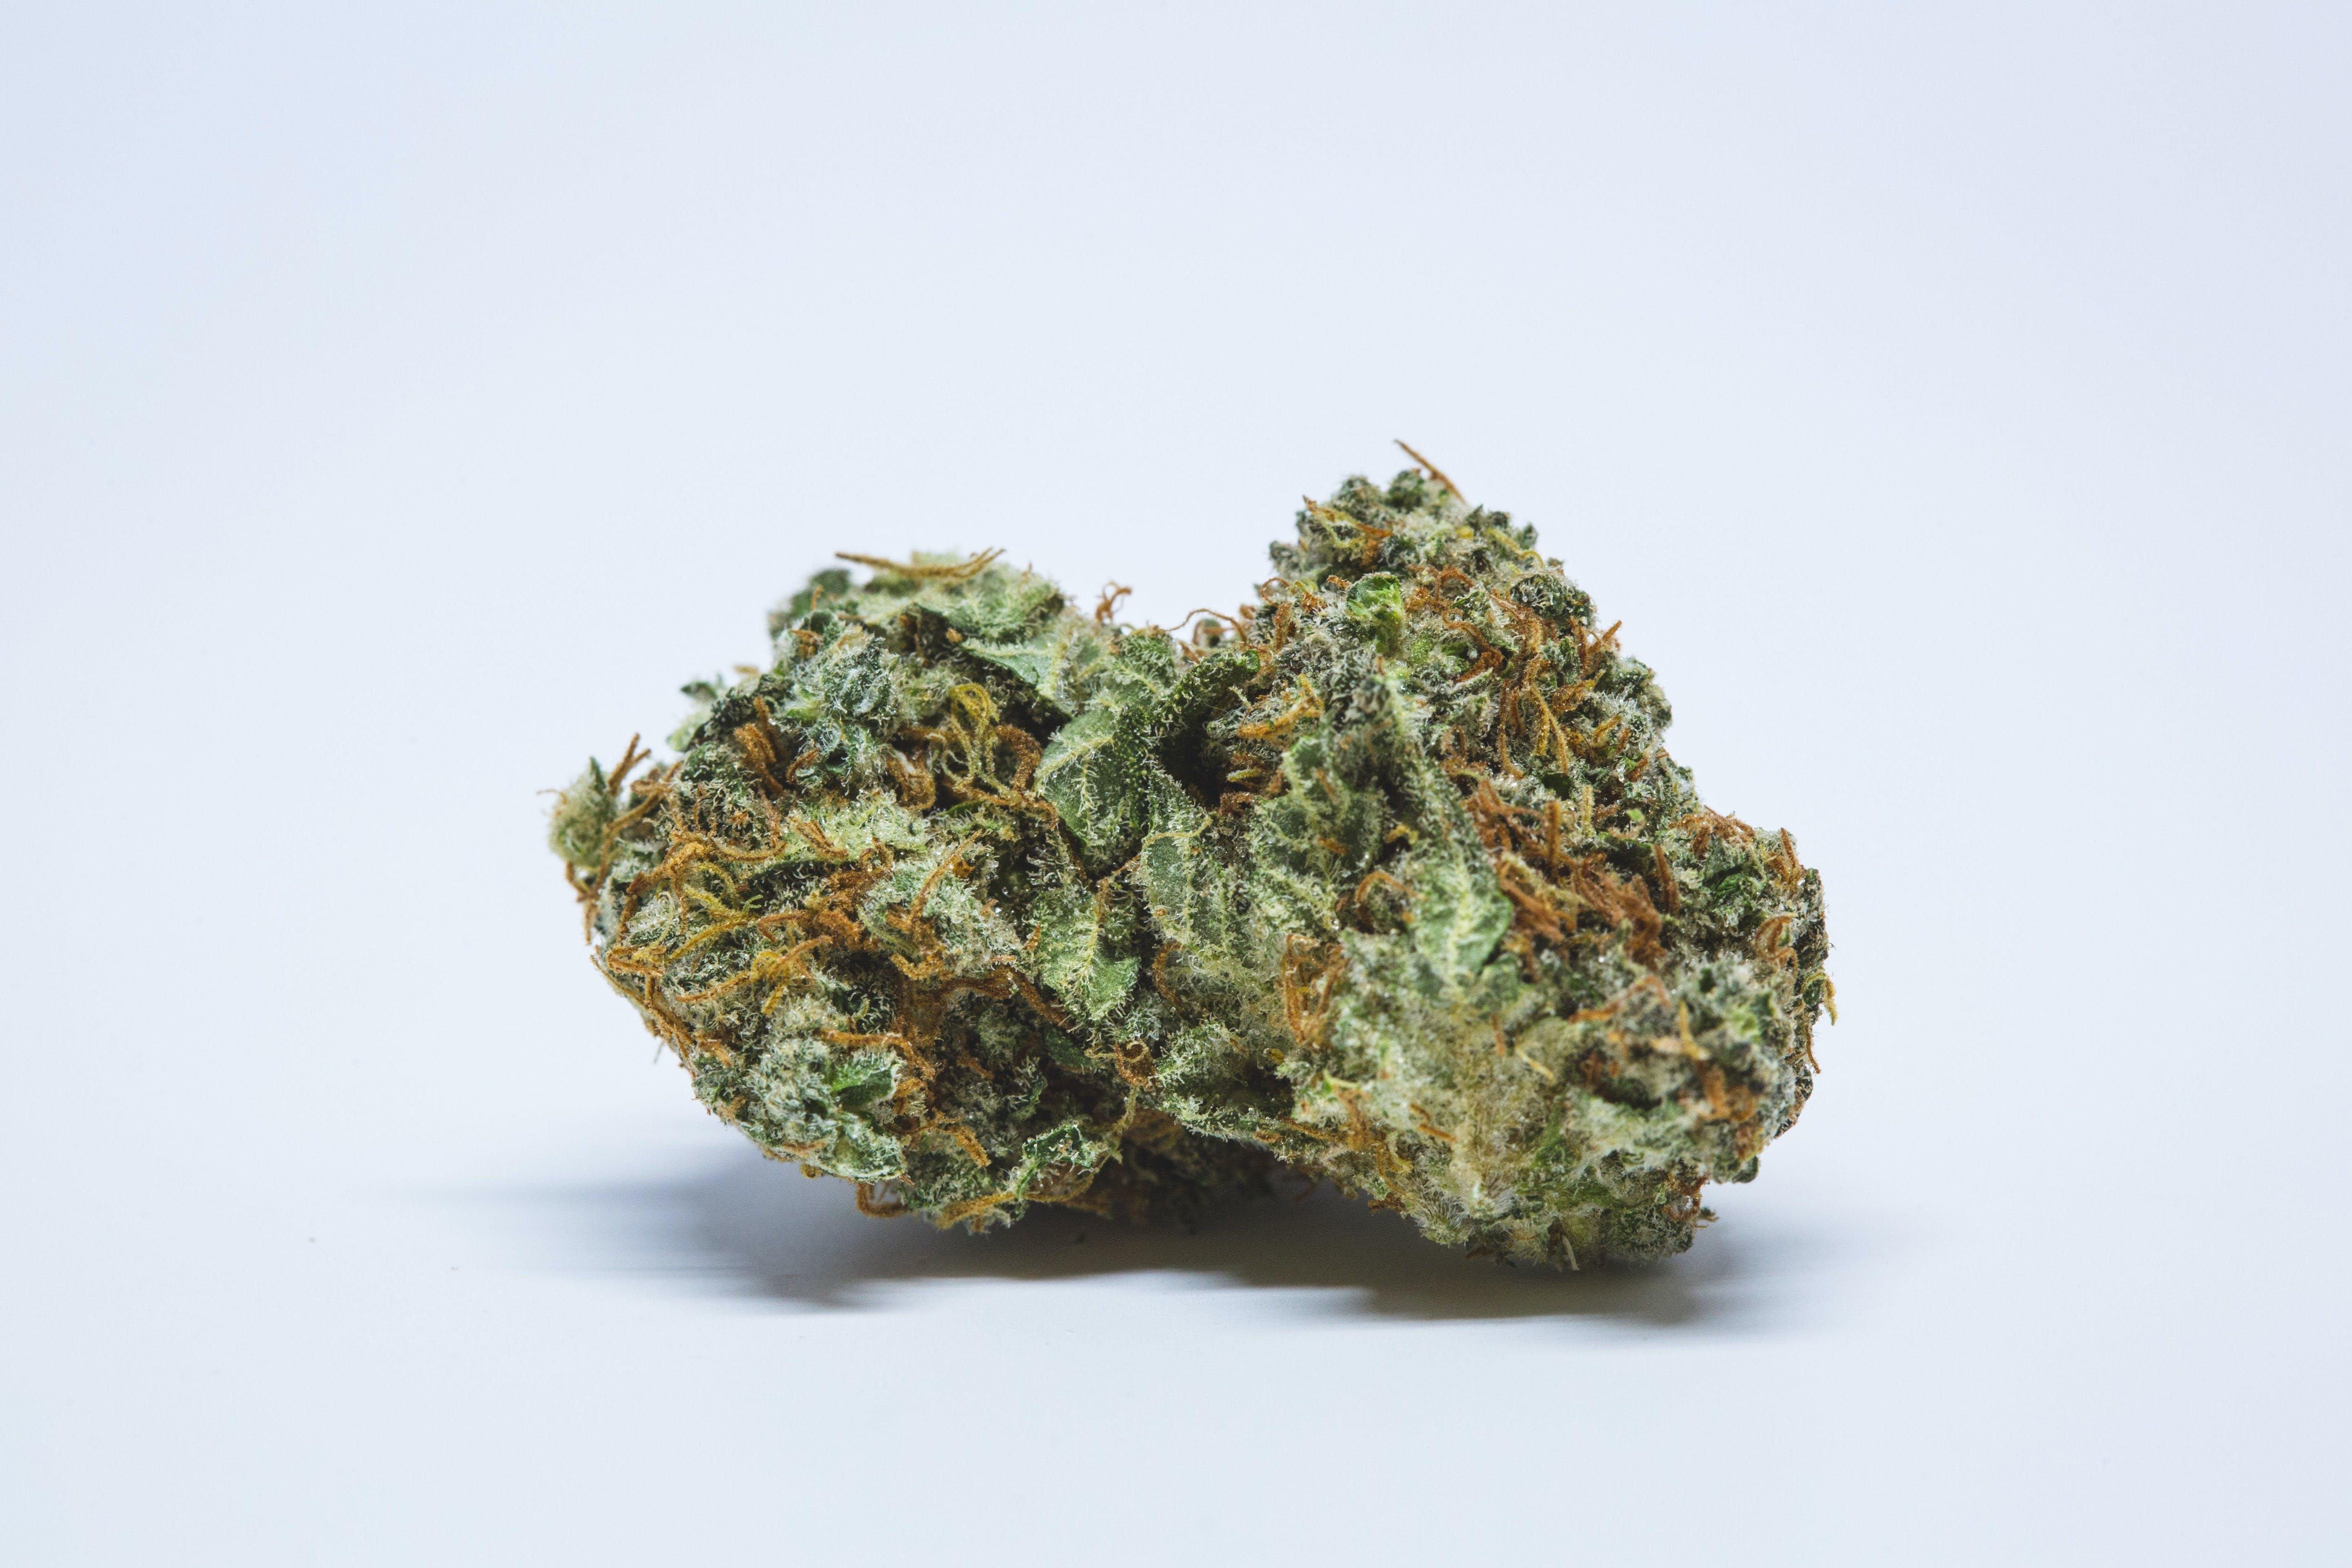 Pink Death Star Weed; Pink Death Star Cannabis Strain; Pink Death Star Indica Marijuana